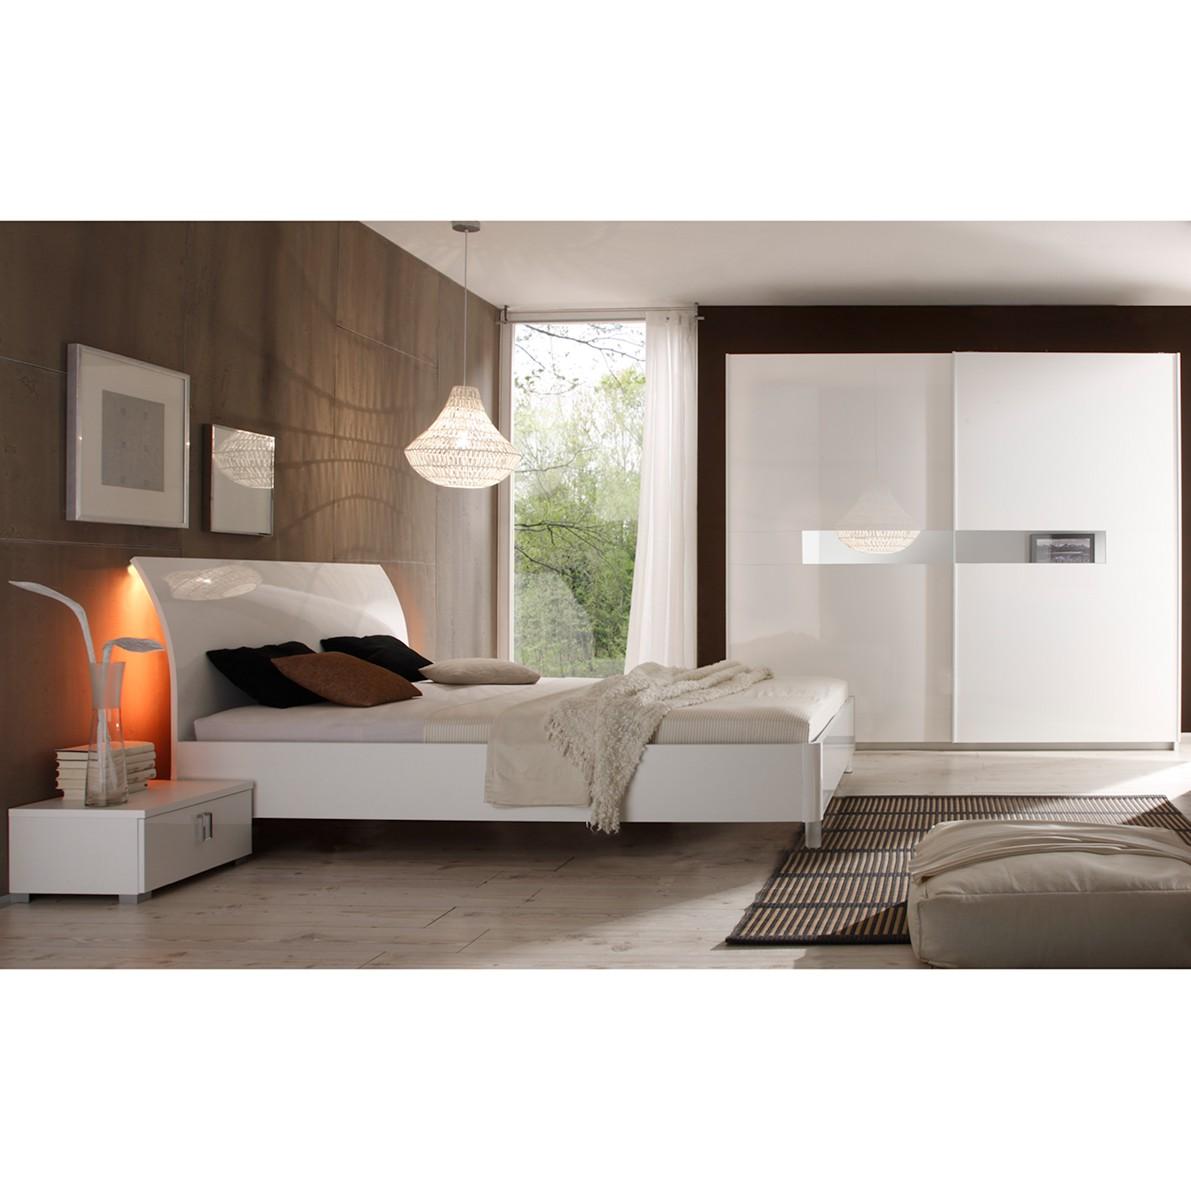 Schlafzimmerset I Lidia - Hochglanz Weiß, Lc Mobili